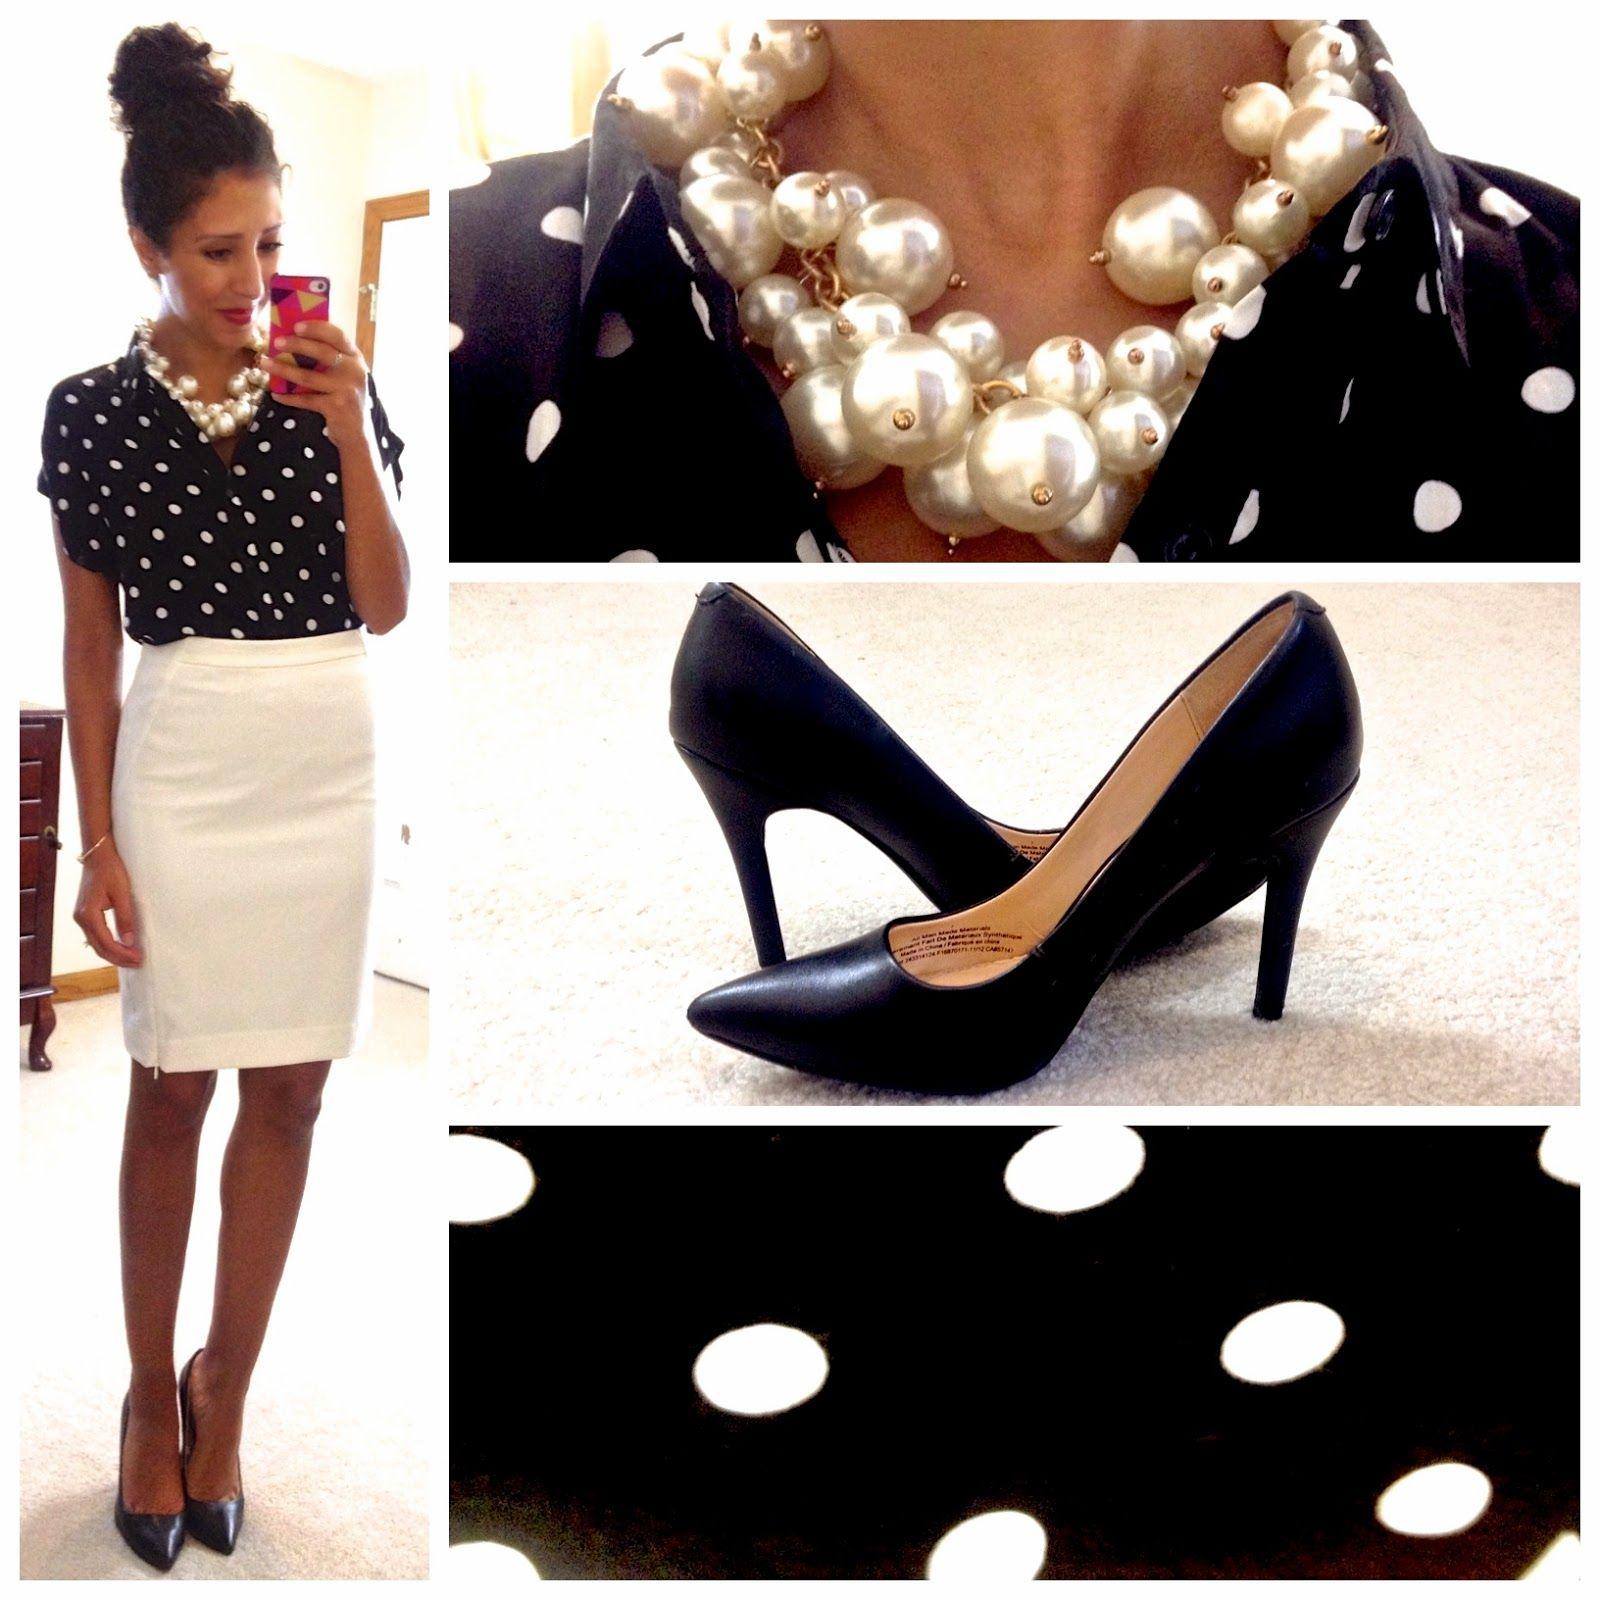 black & white polka dot blouse / white pencil skirt / black pumps